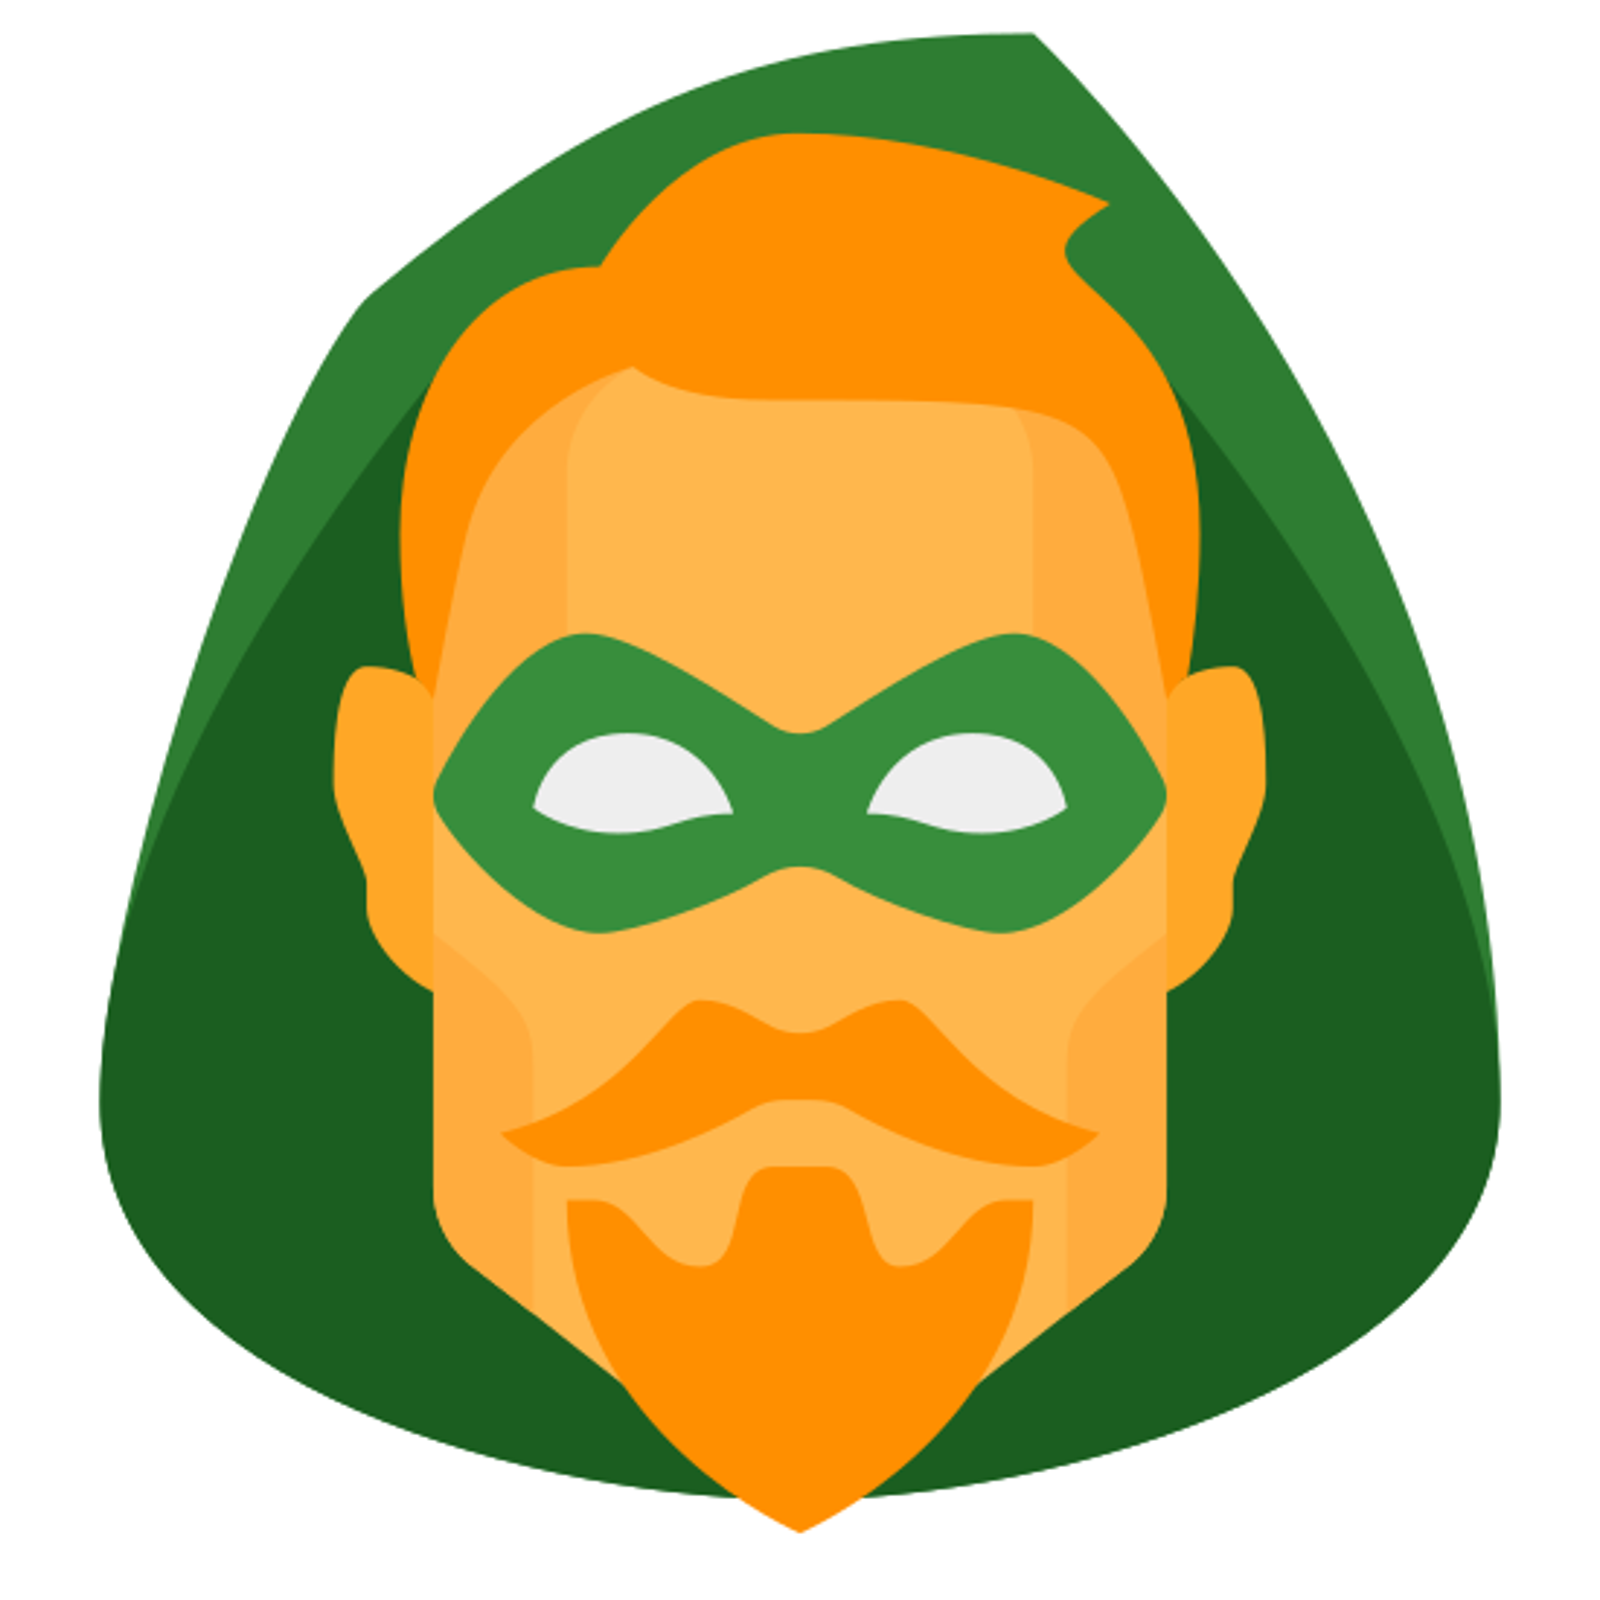 Green Arrow DC icon